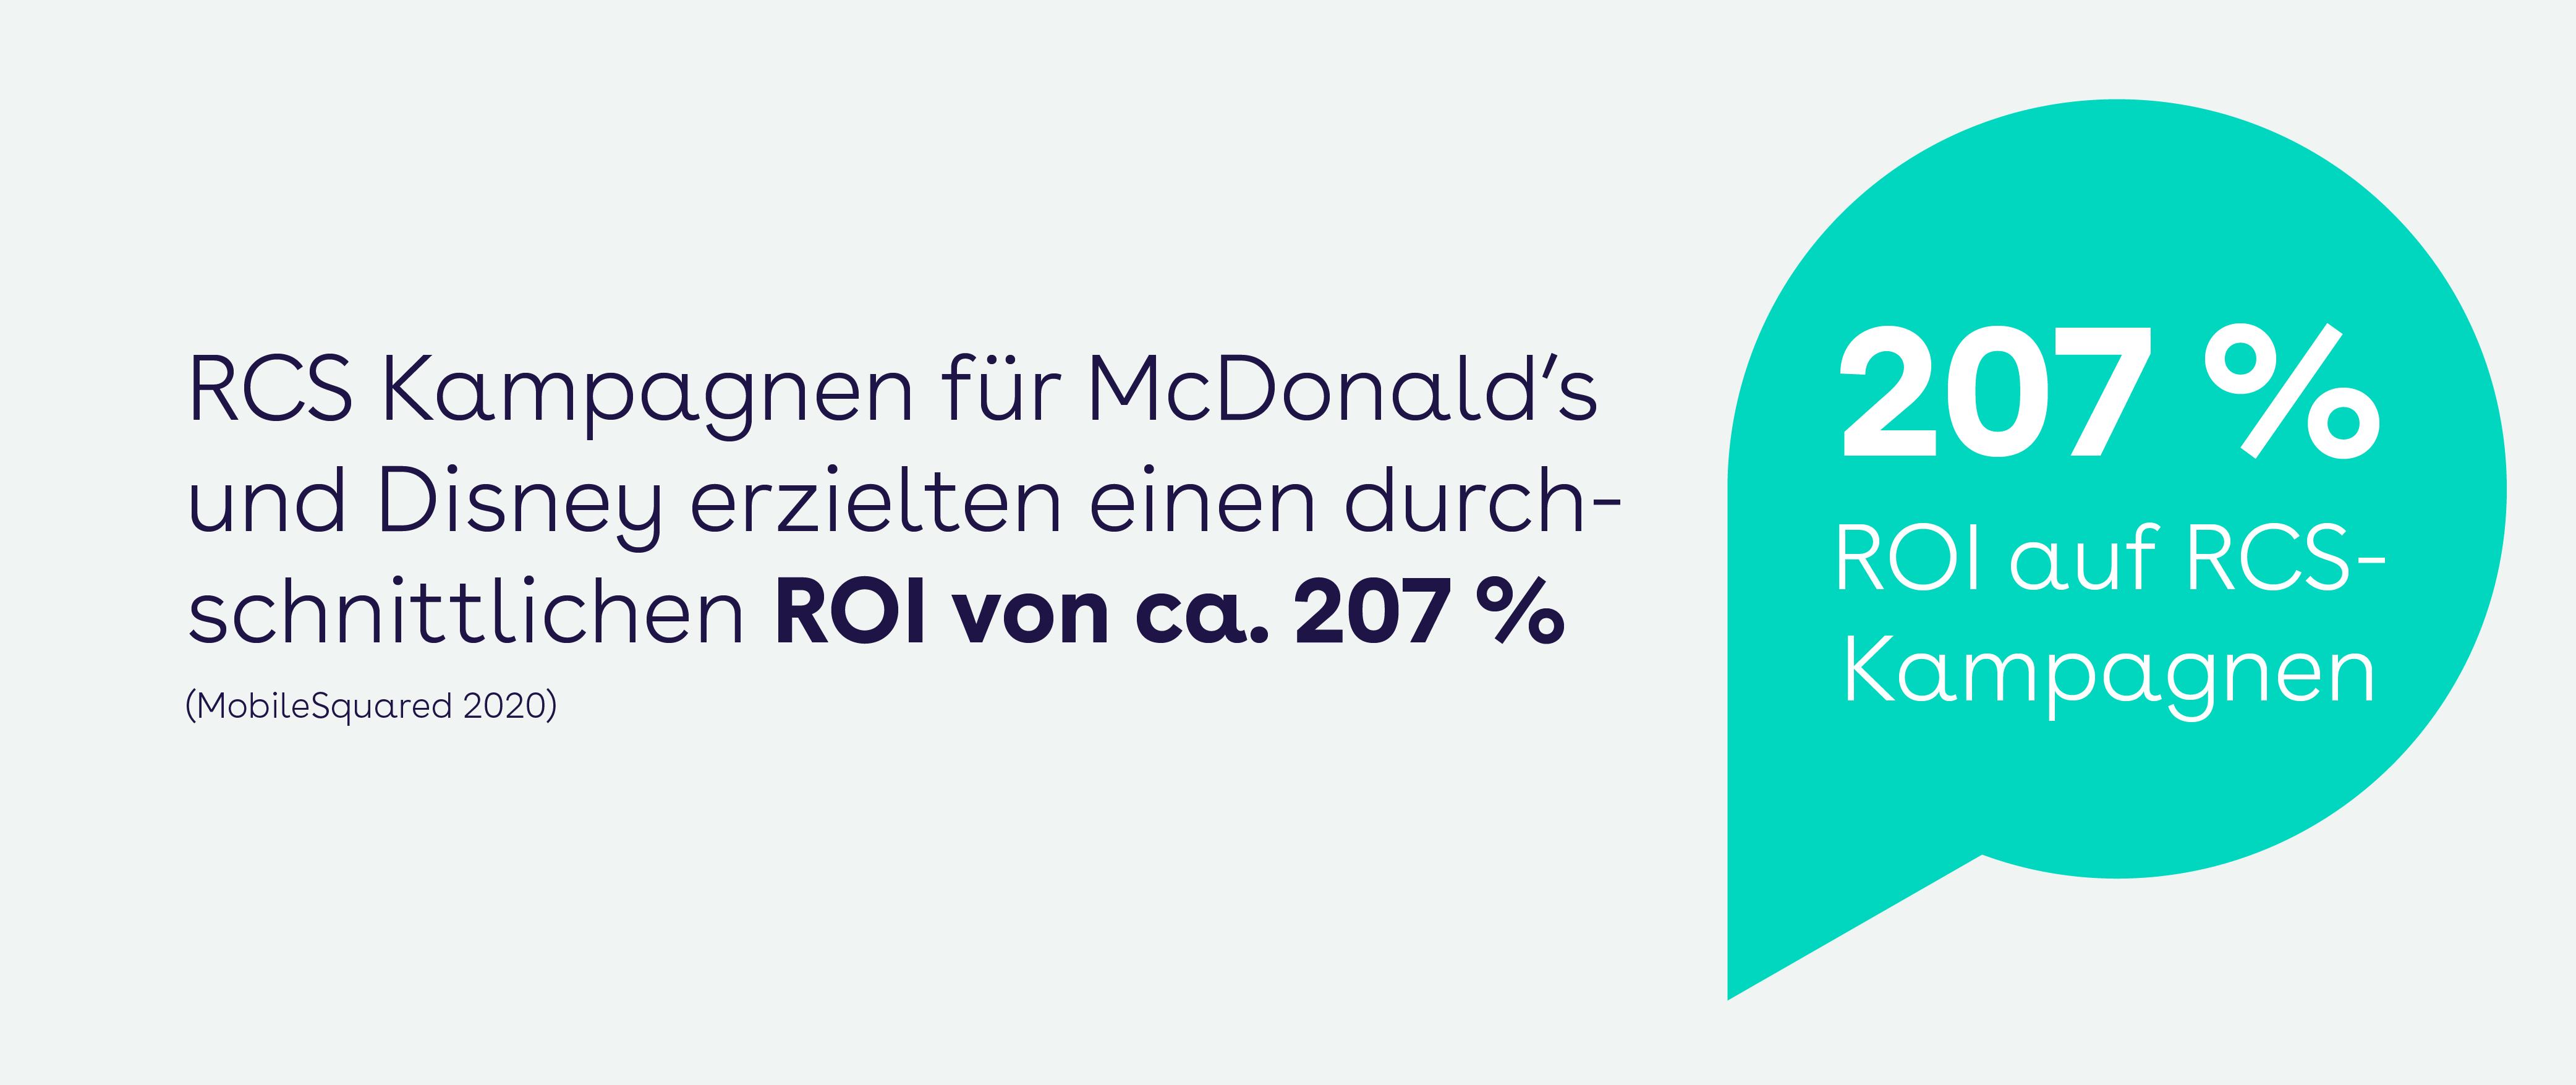 websms - RCS 207 % ROI auf RCS-Kampagnen